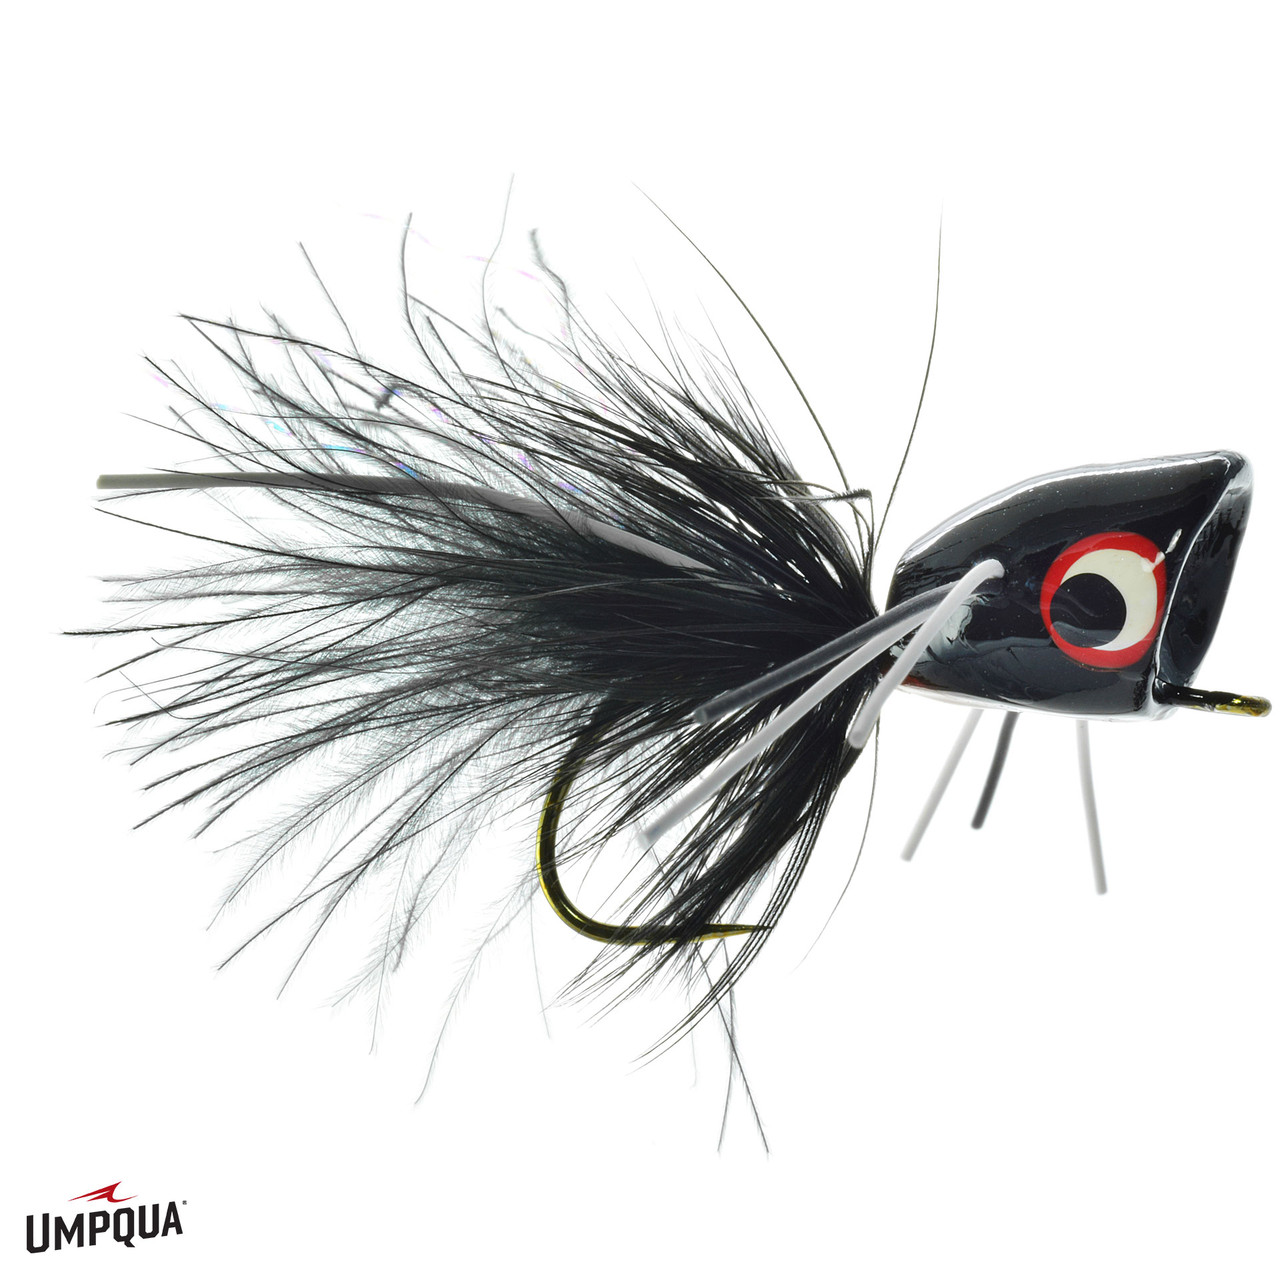 Umpqua Feather Merchants Bass Popper Mega Assorted Fly Fishing Kit 18 Piece